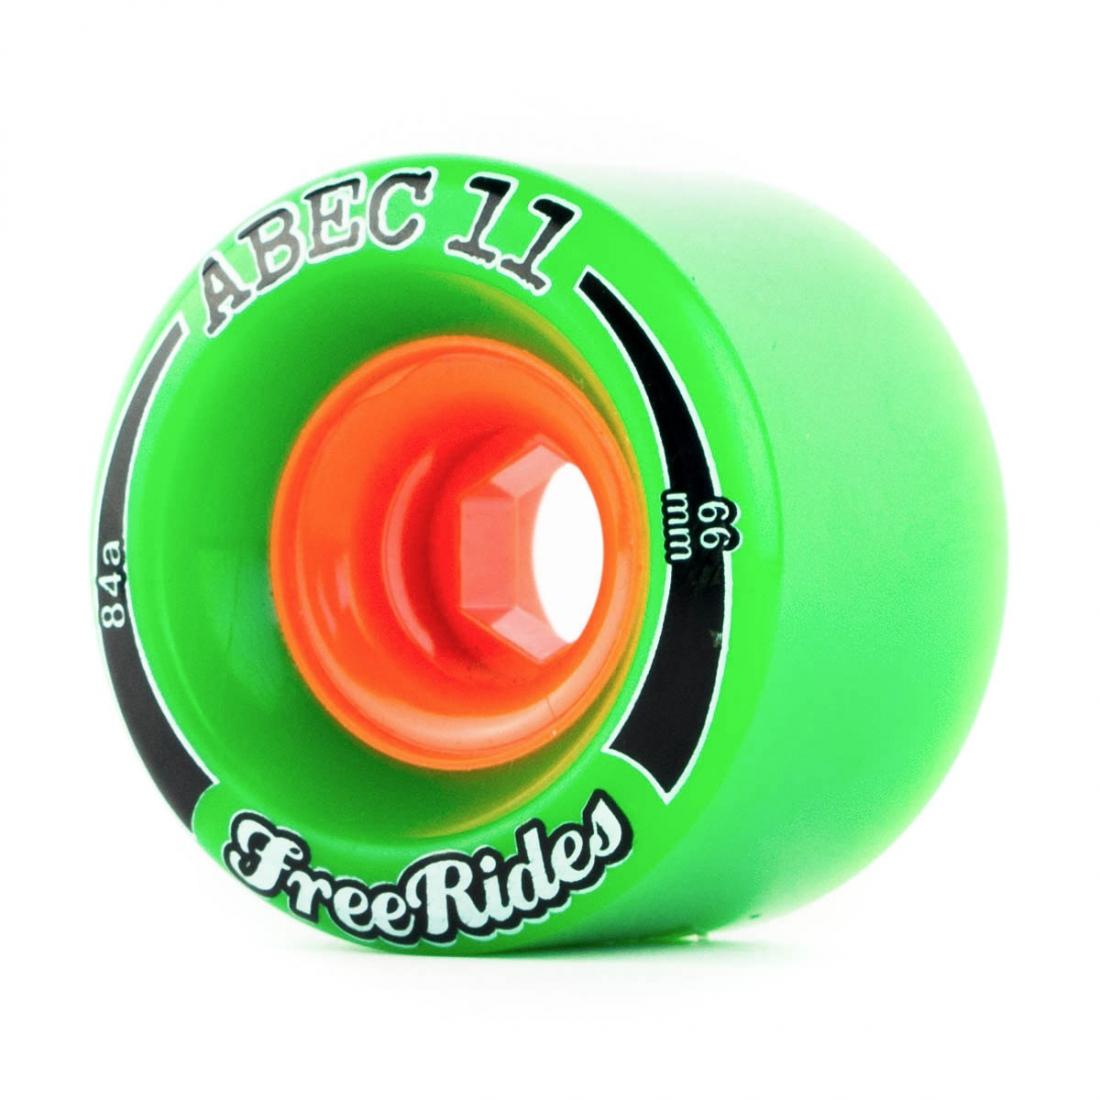 ABEC 11 Classic FreeRides 66 mm